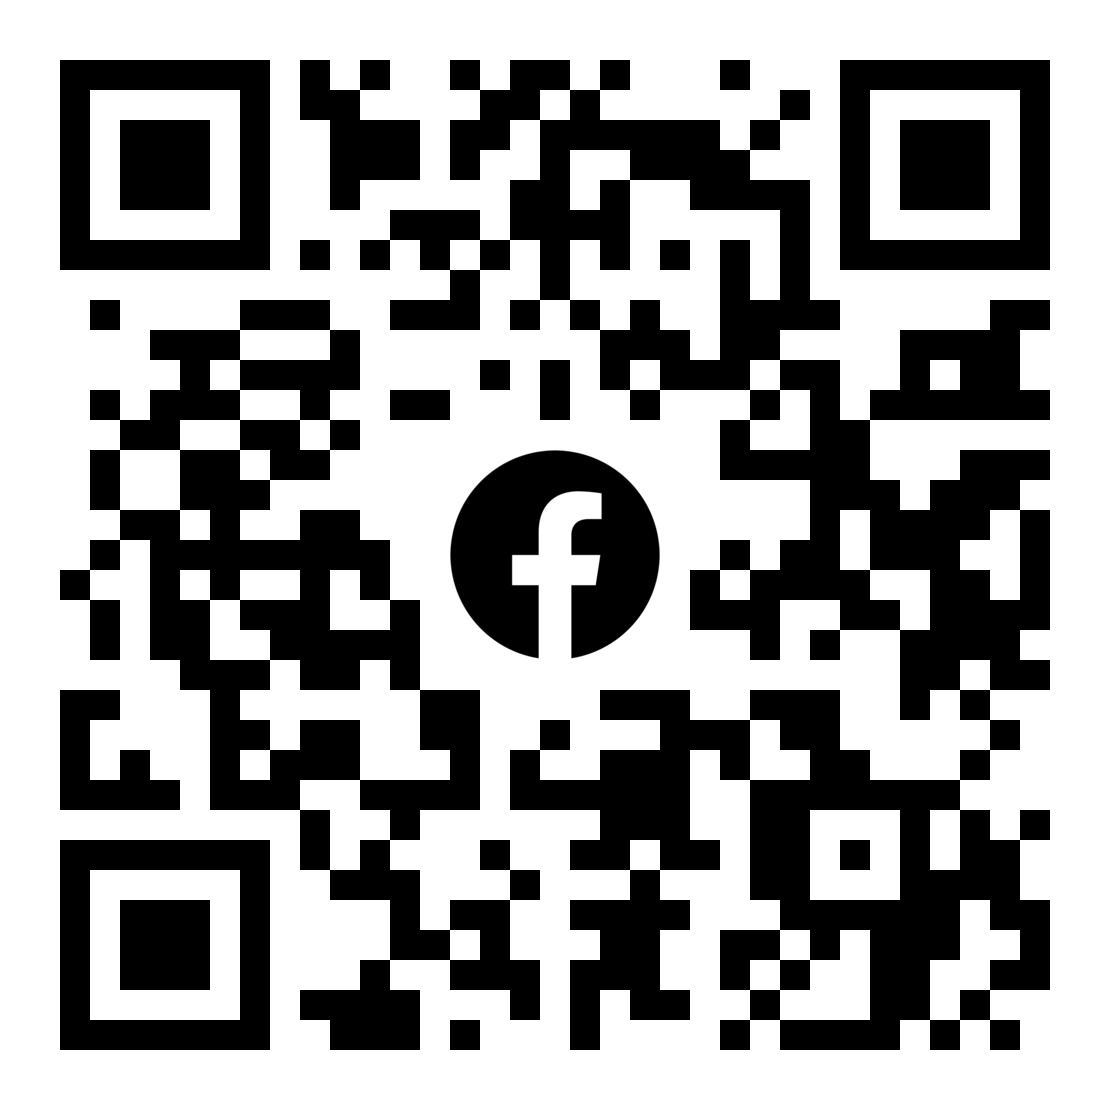 178554660_261253562364327_2789182441411510008_n